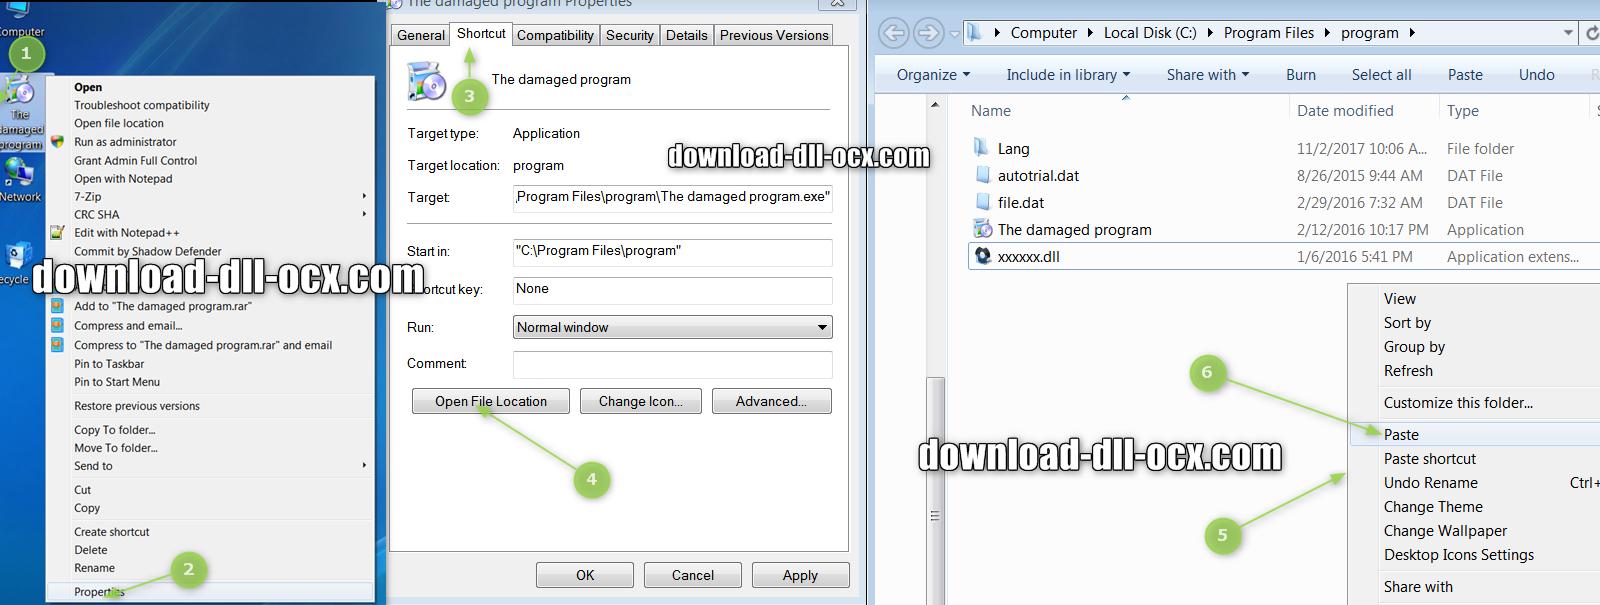 how to install spttseng.dll file? for fix missing